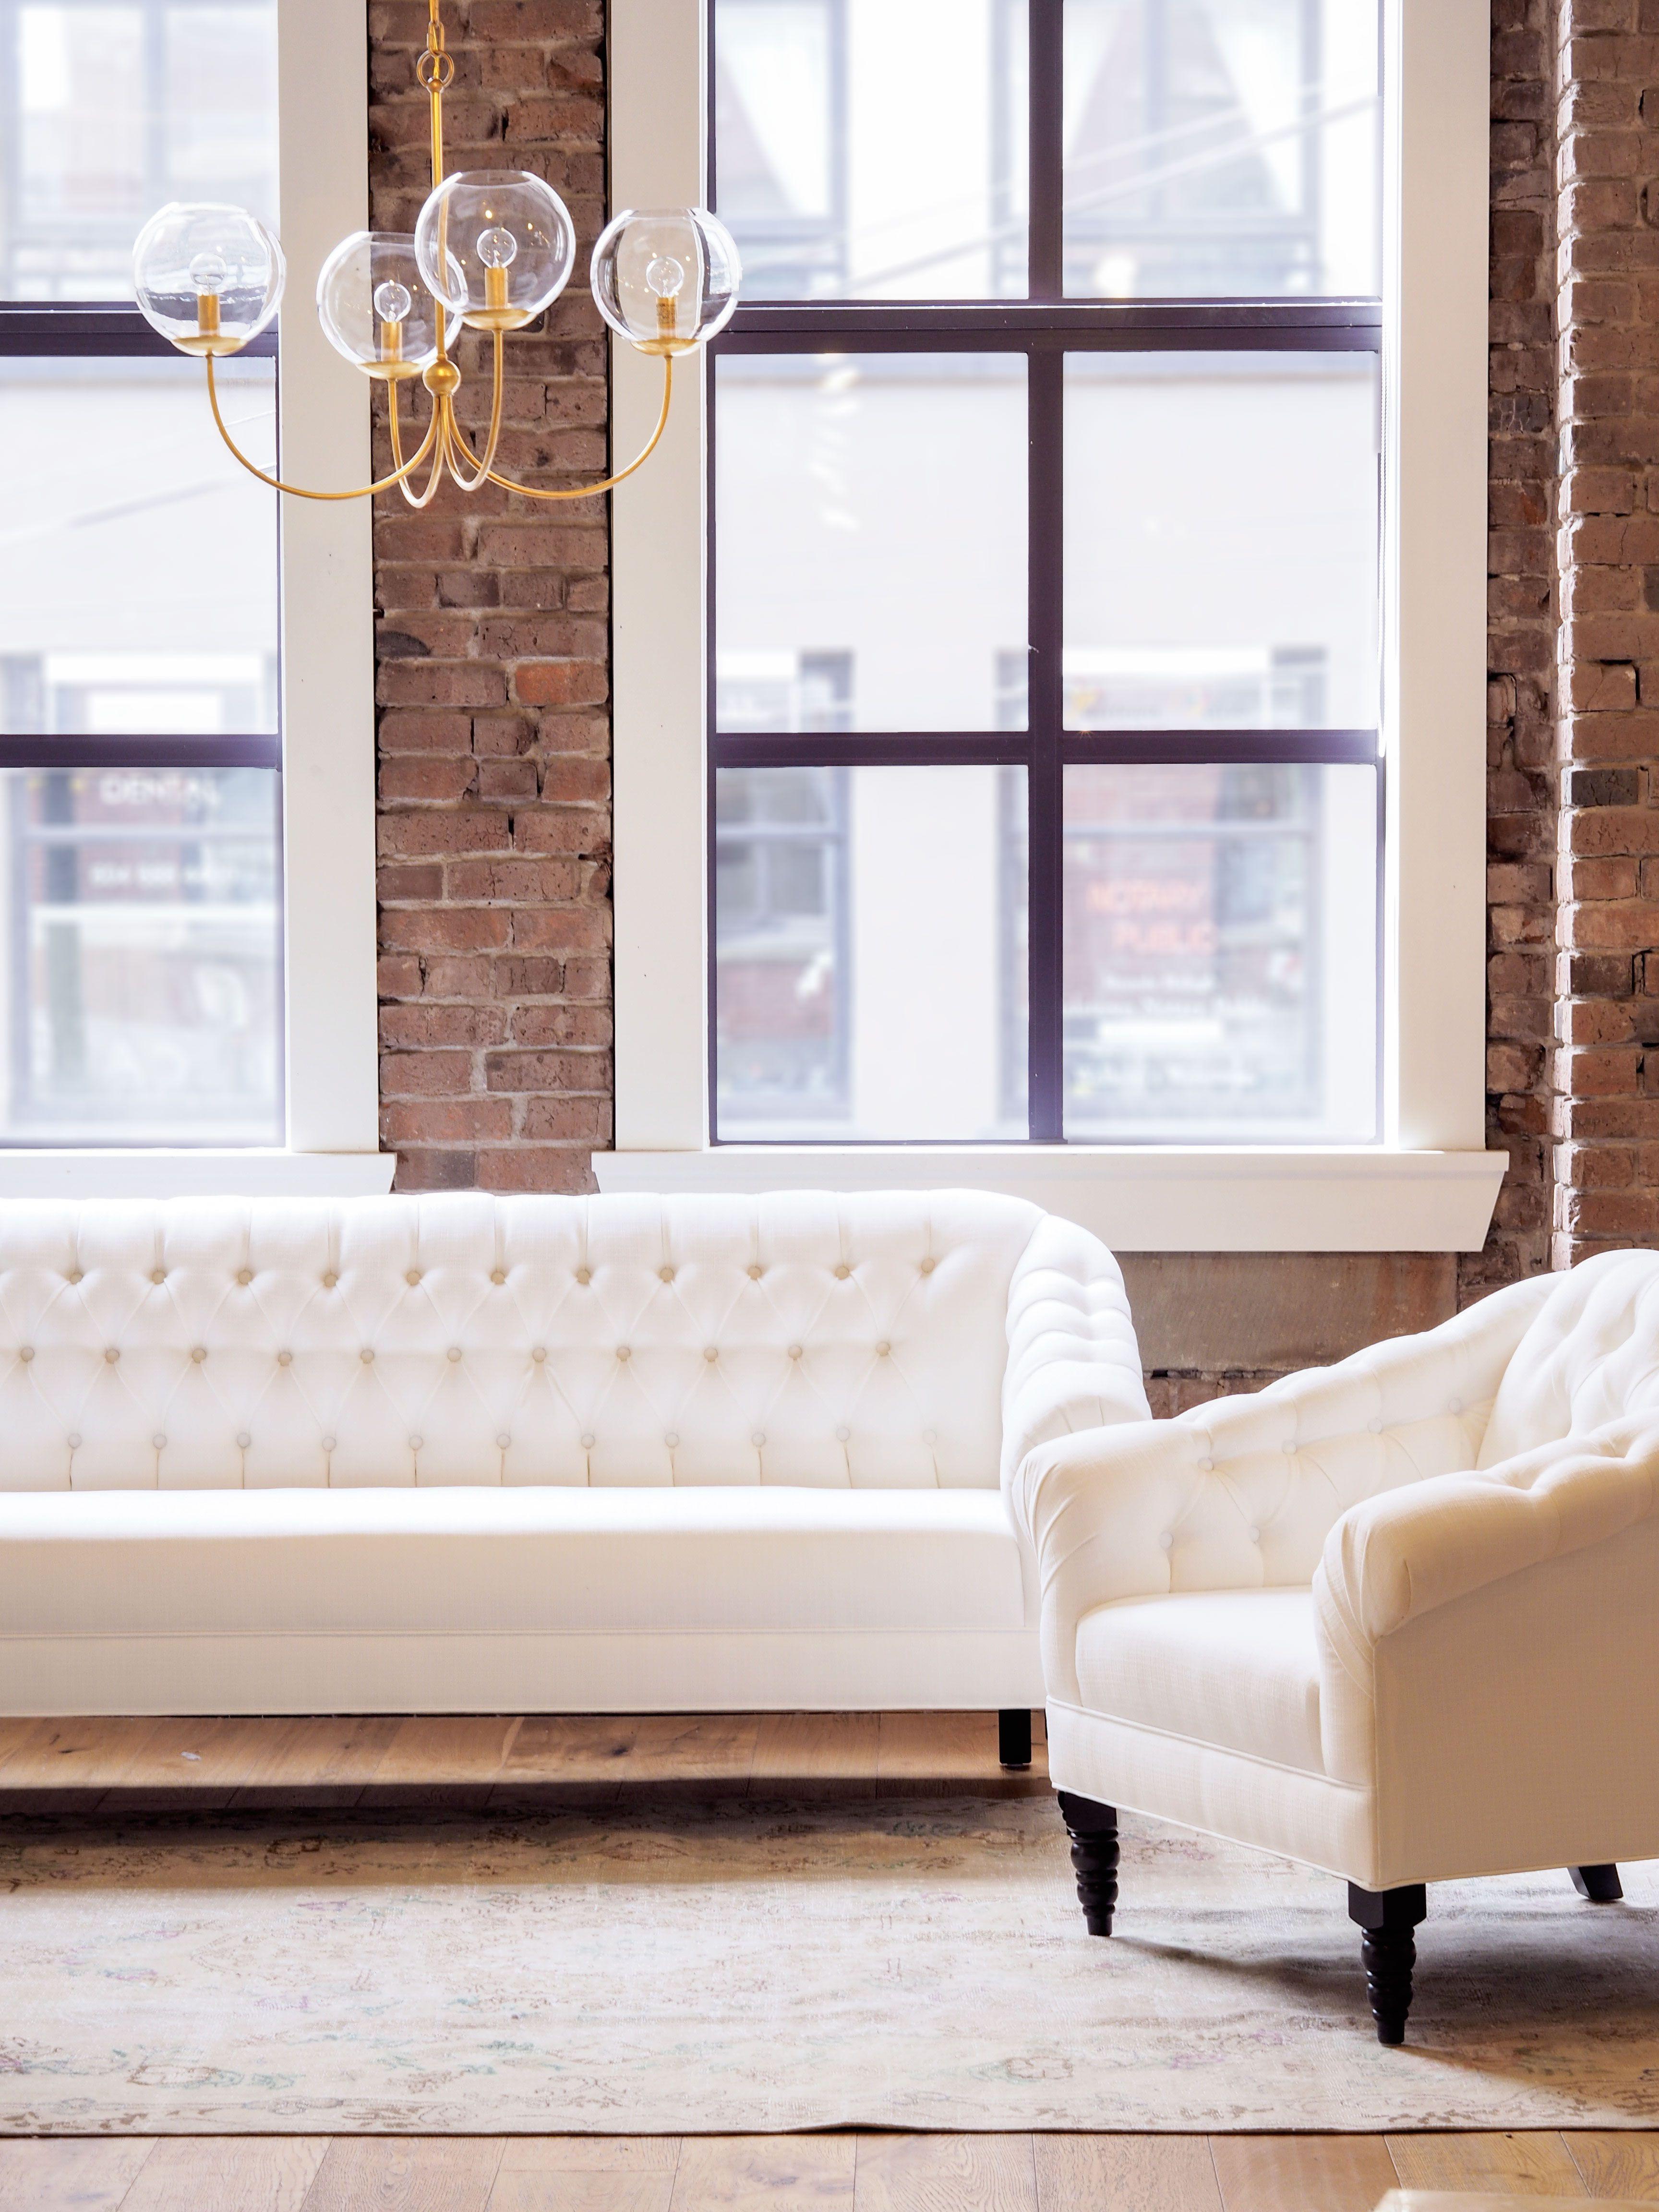 Tufted Sofa White Style Home House Chic Interiordesign Love Furniture Design Furniture Living Furniture